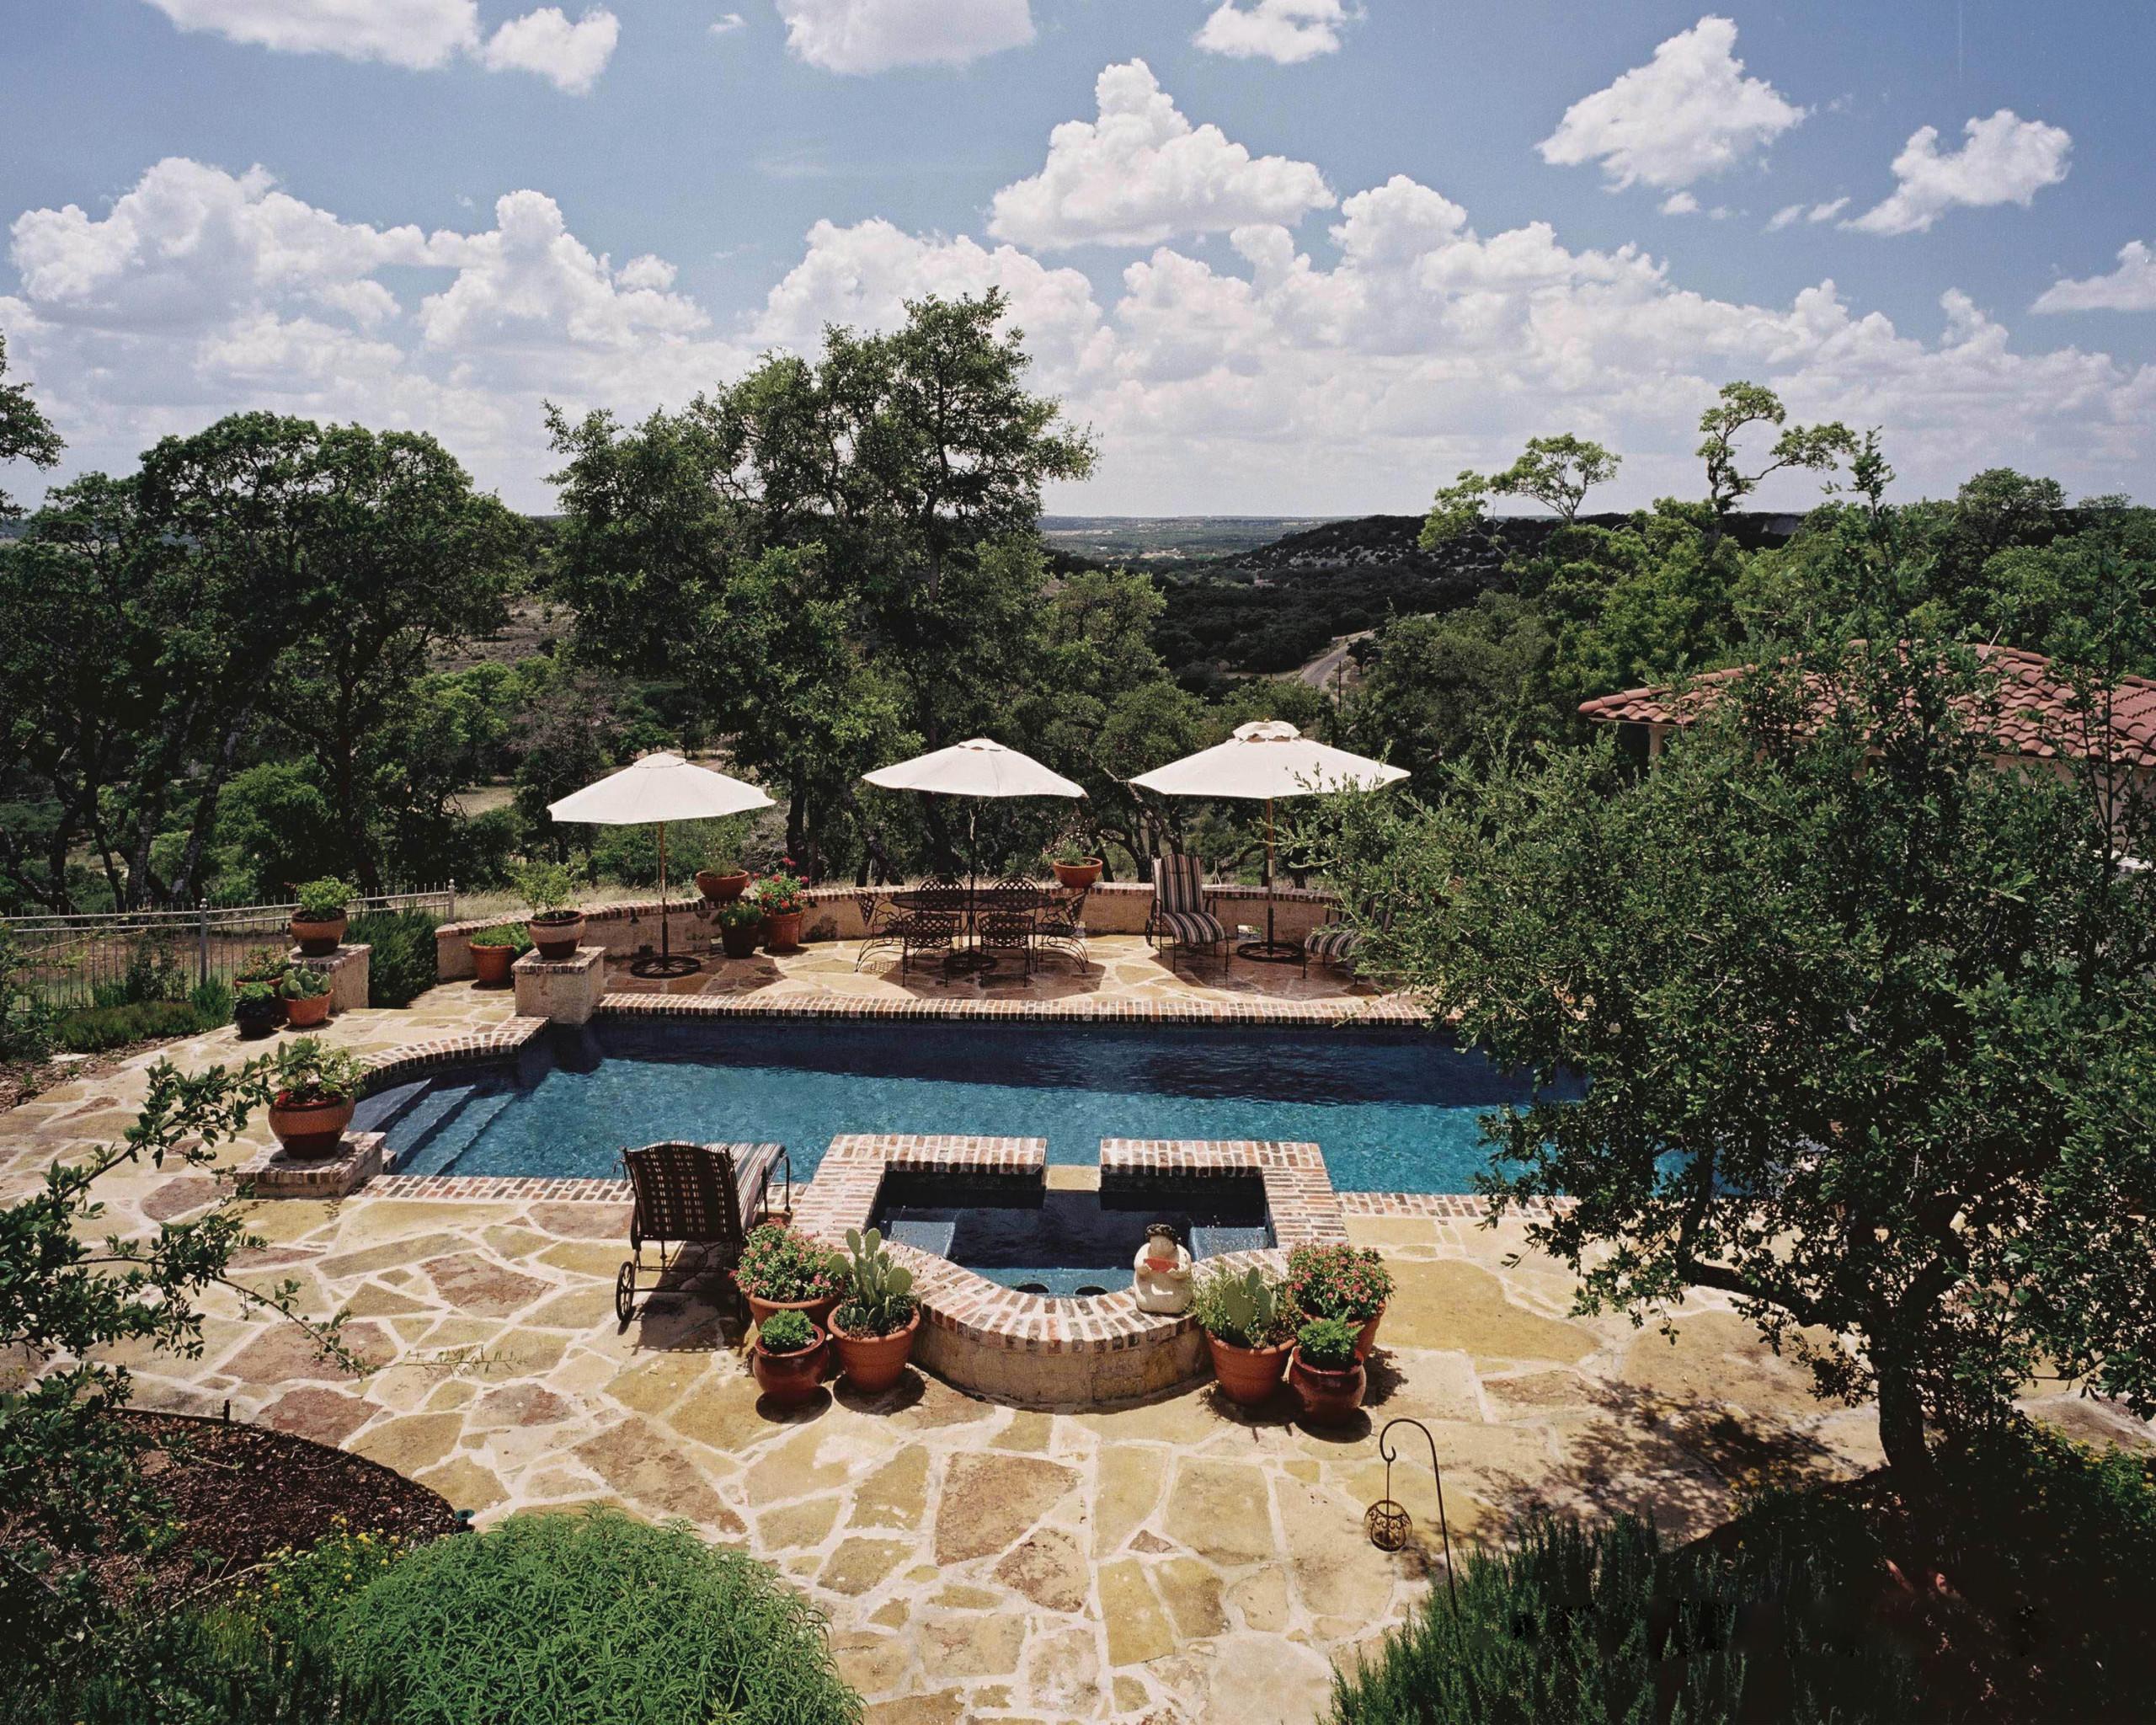 Fredericksburg Classic Rustic Formal Pool/Spa/OutdoorLiving